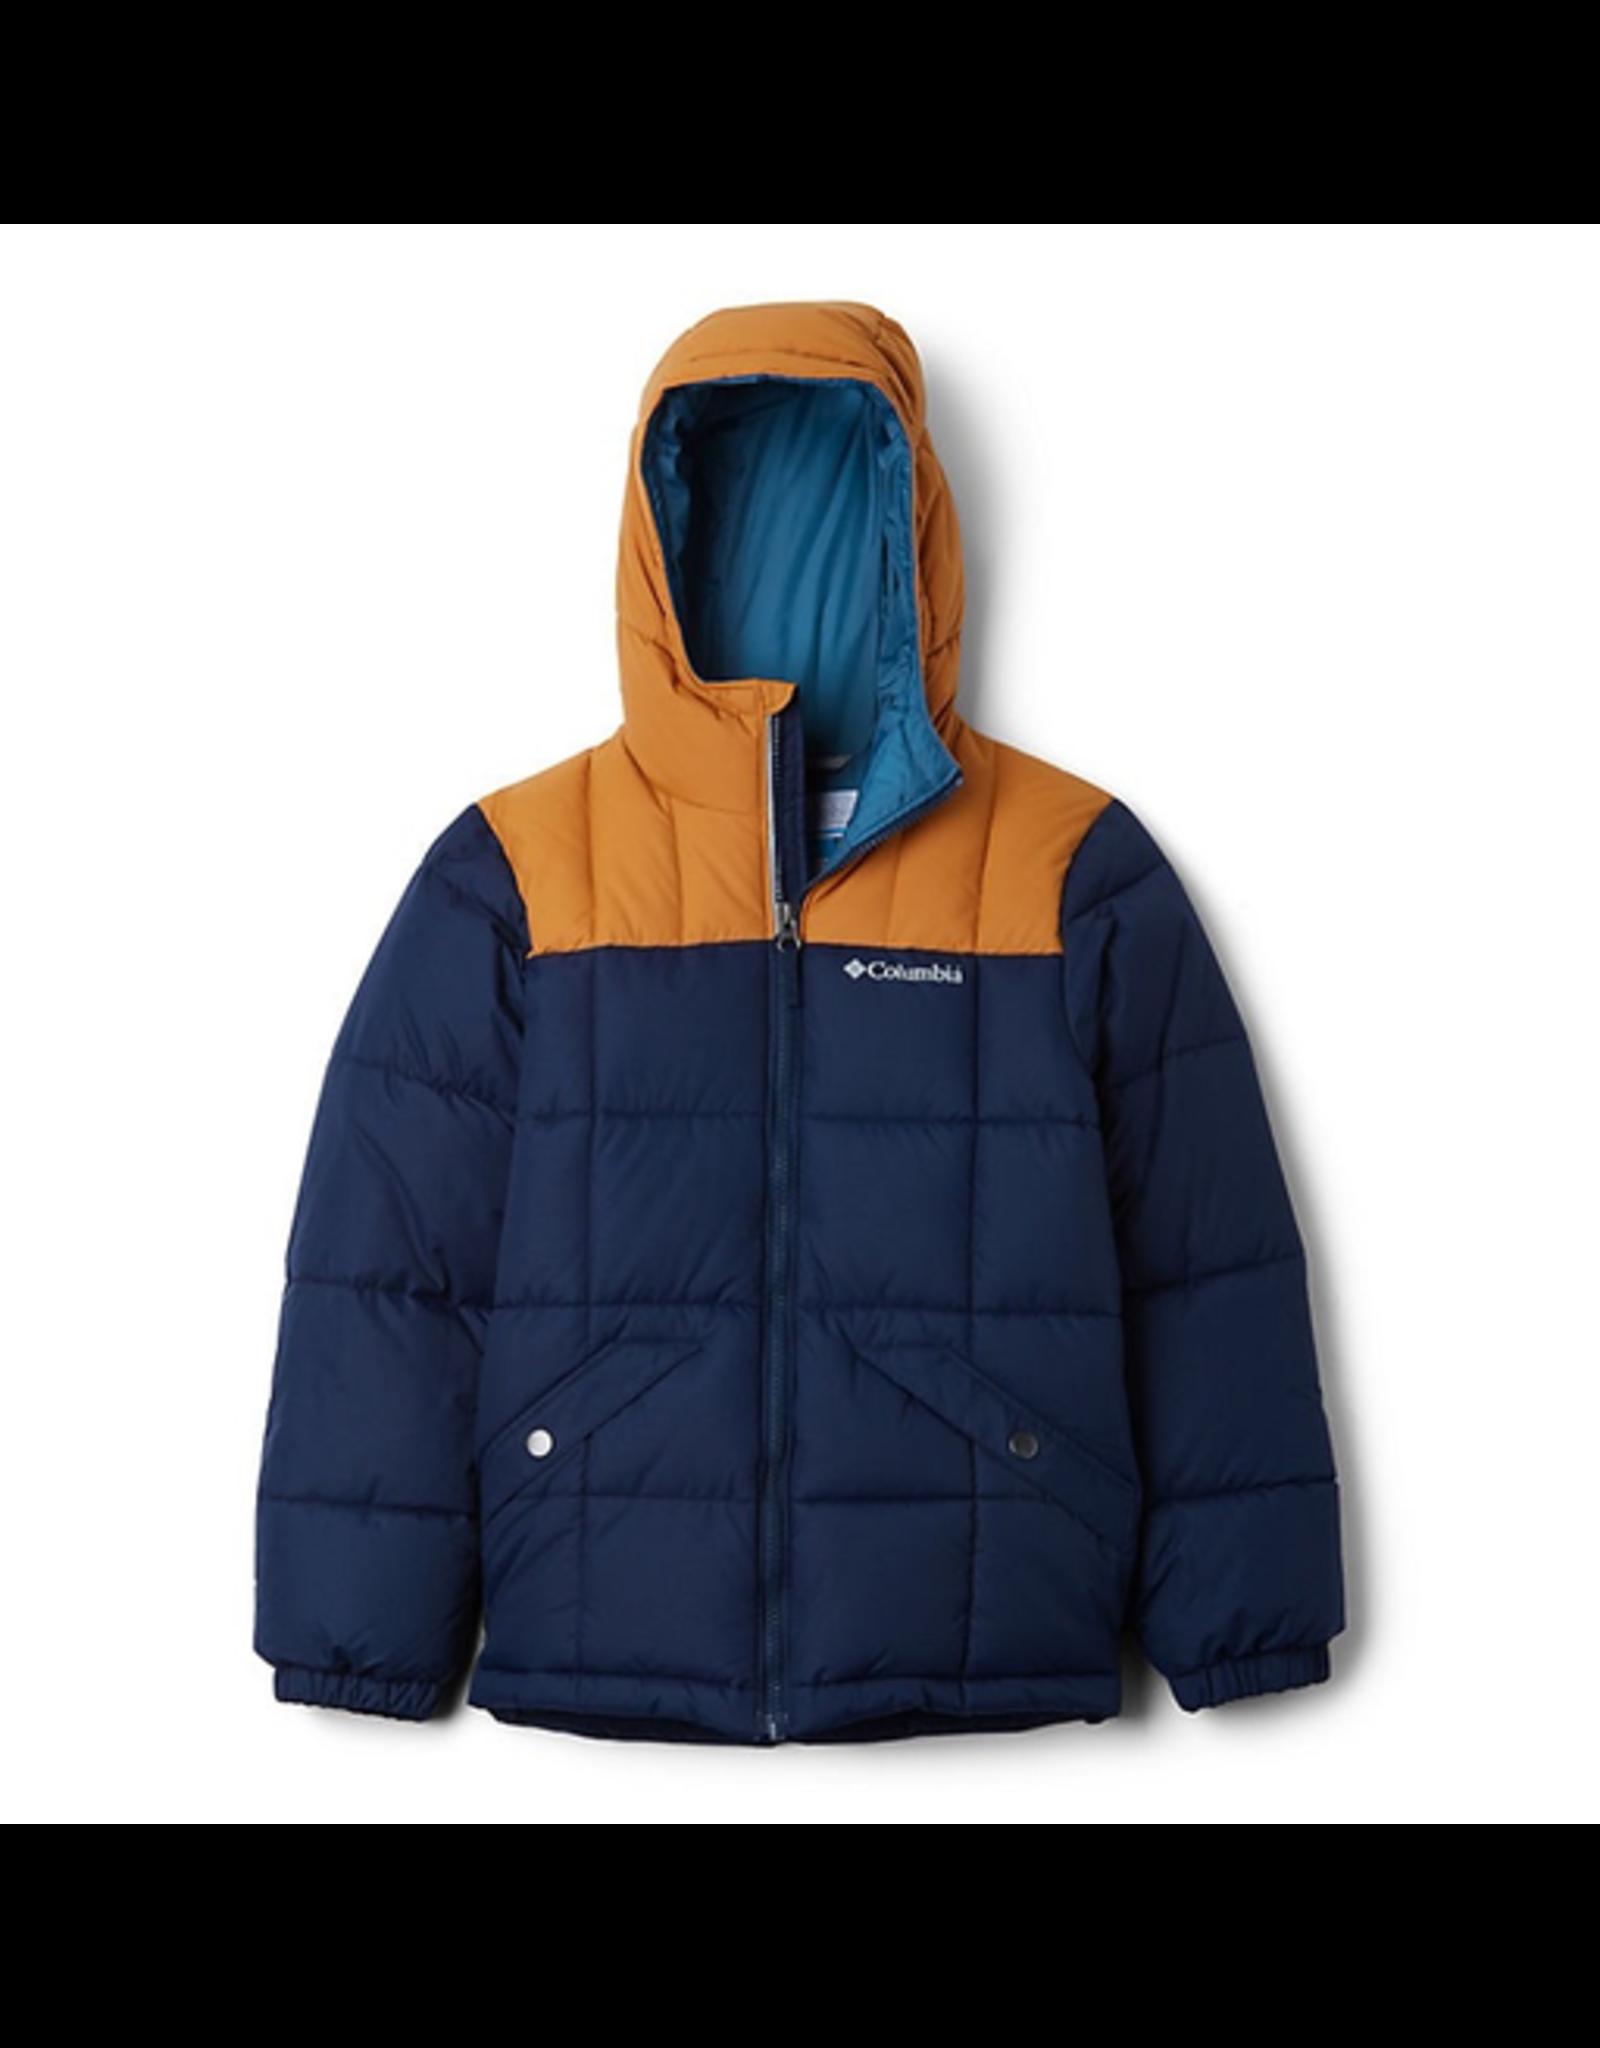 Columbia Columbia Boy's Gyroslope Jacket